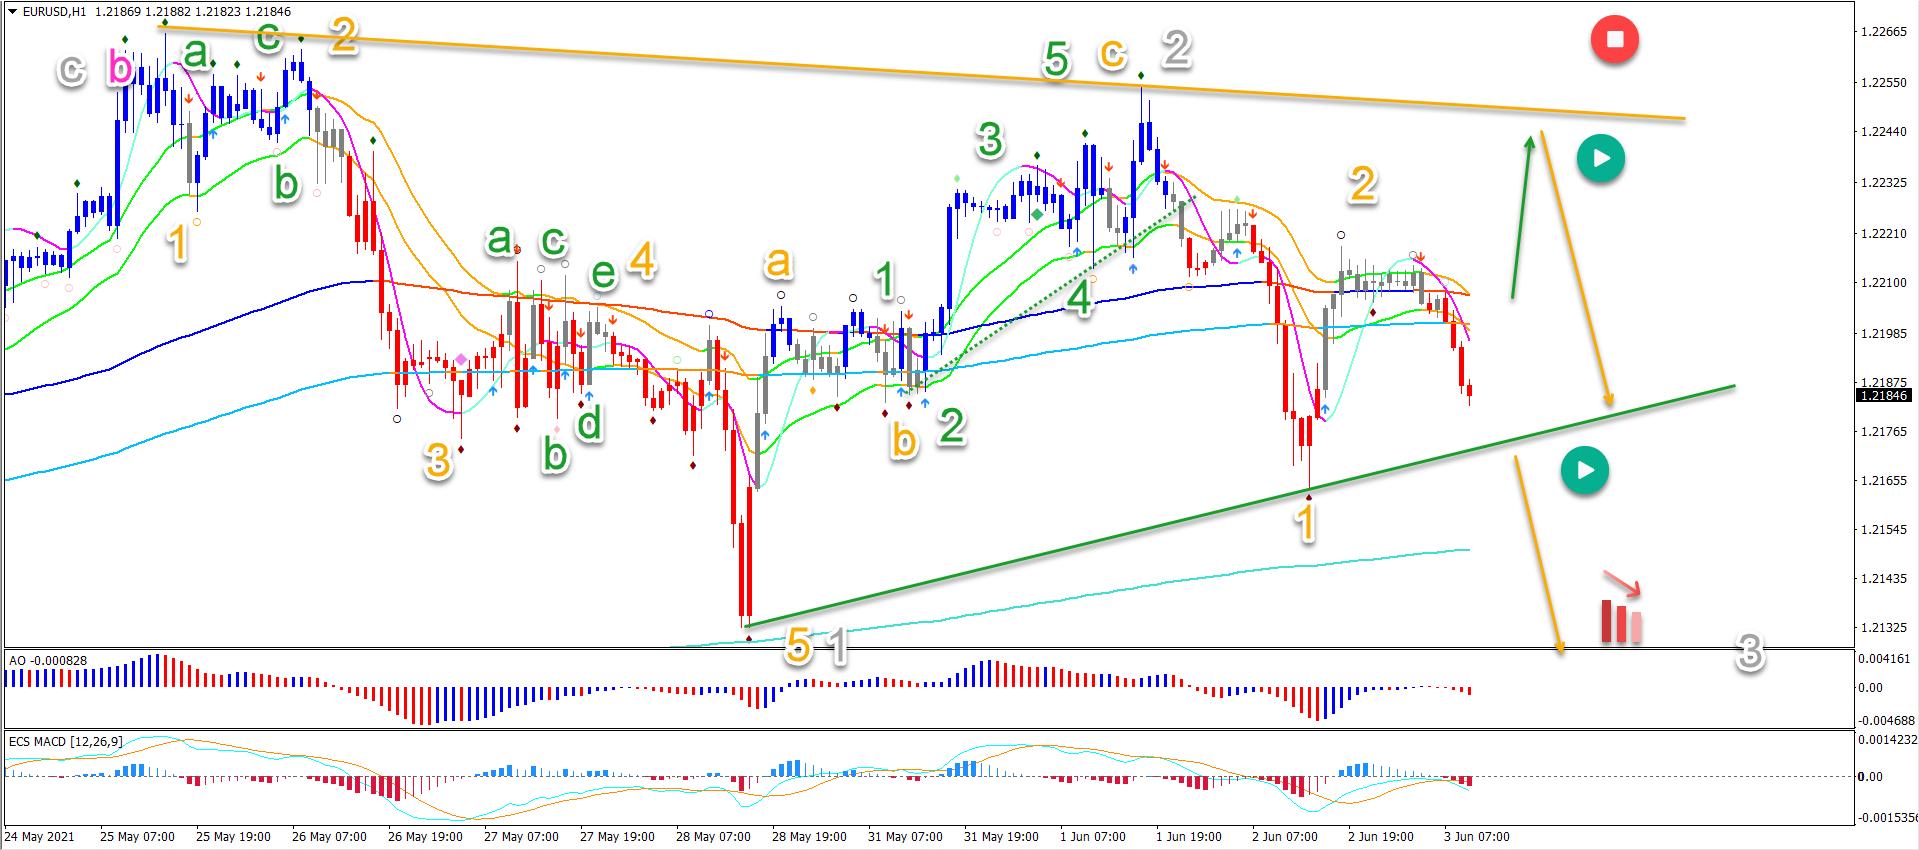 EUR/USD 03.06.2021 1 hour chart